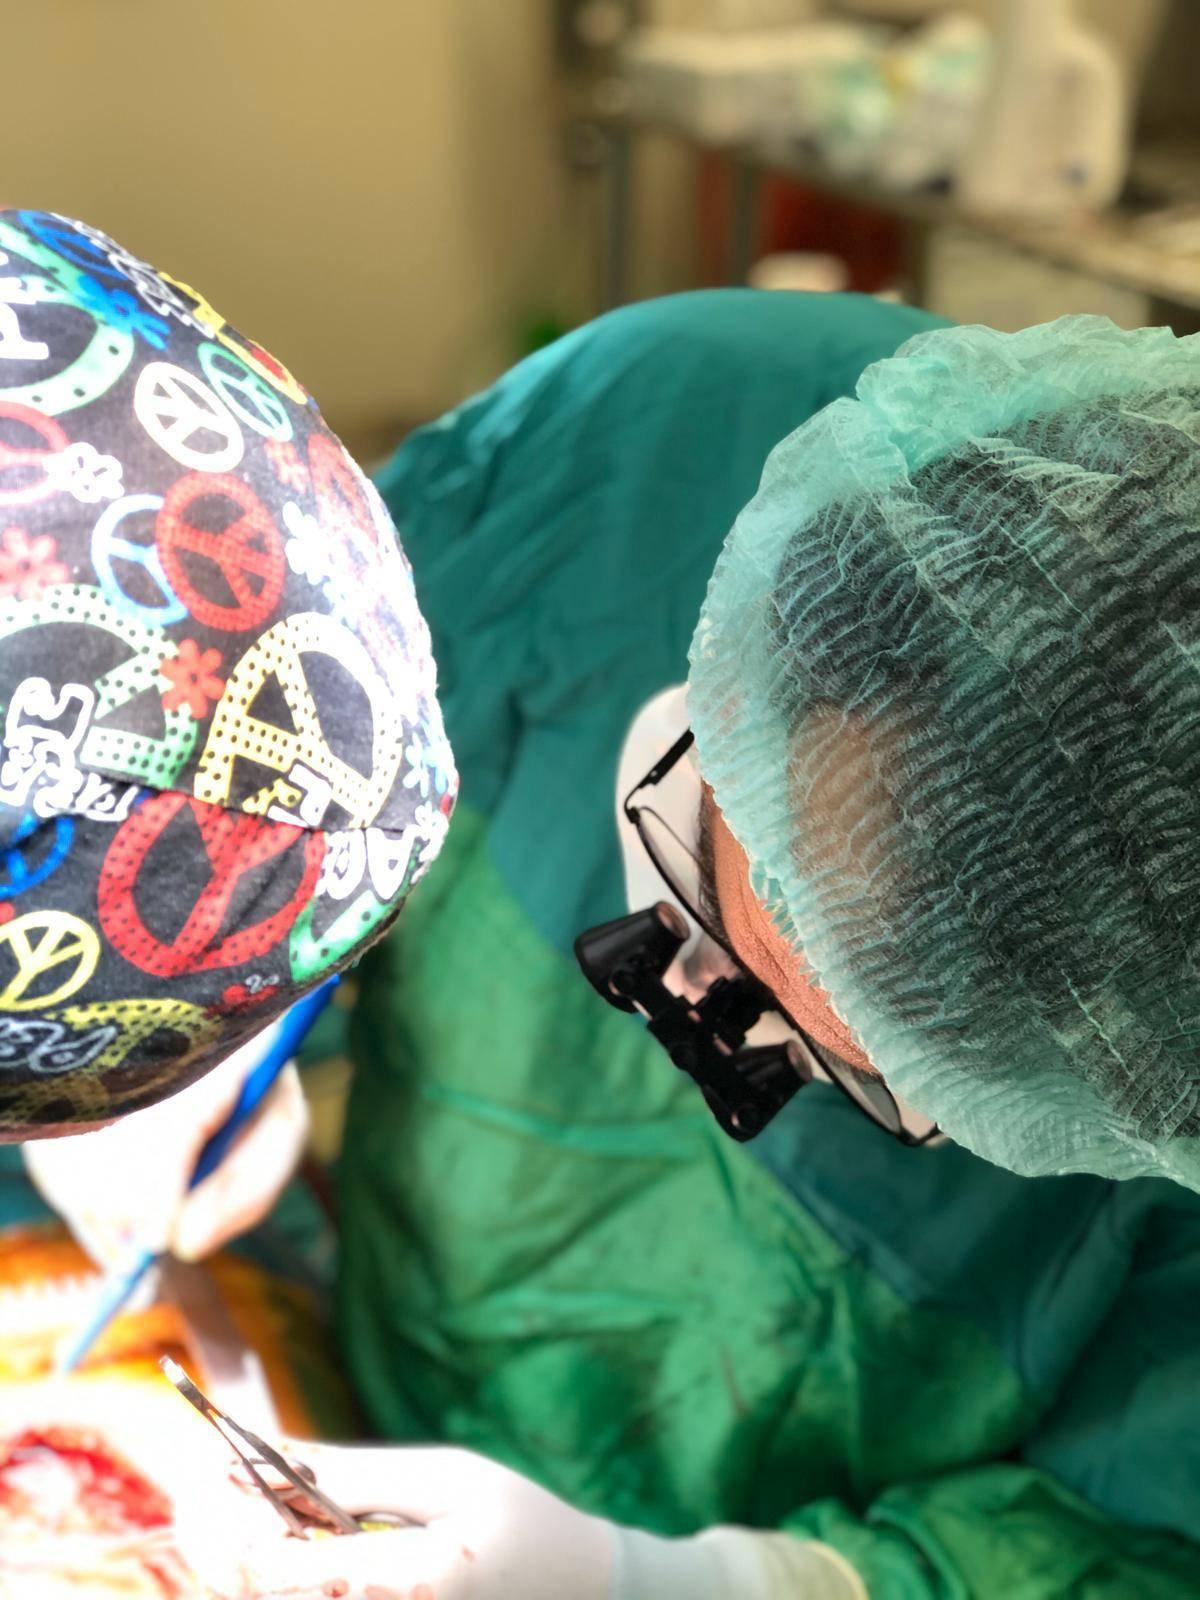 mitral kapak ameliyatı